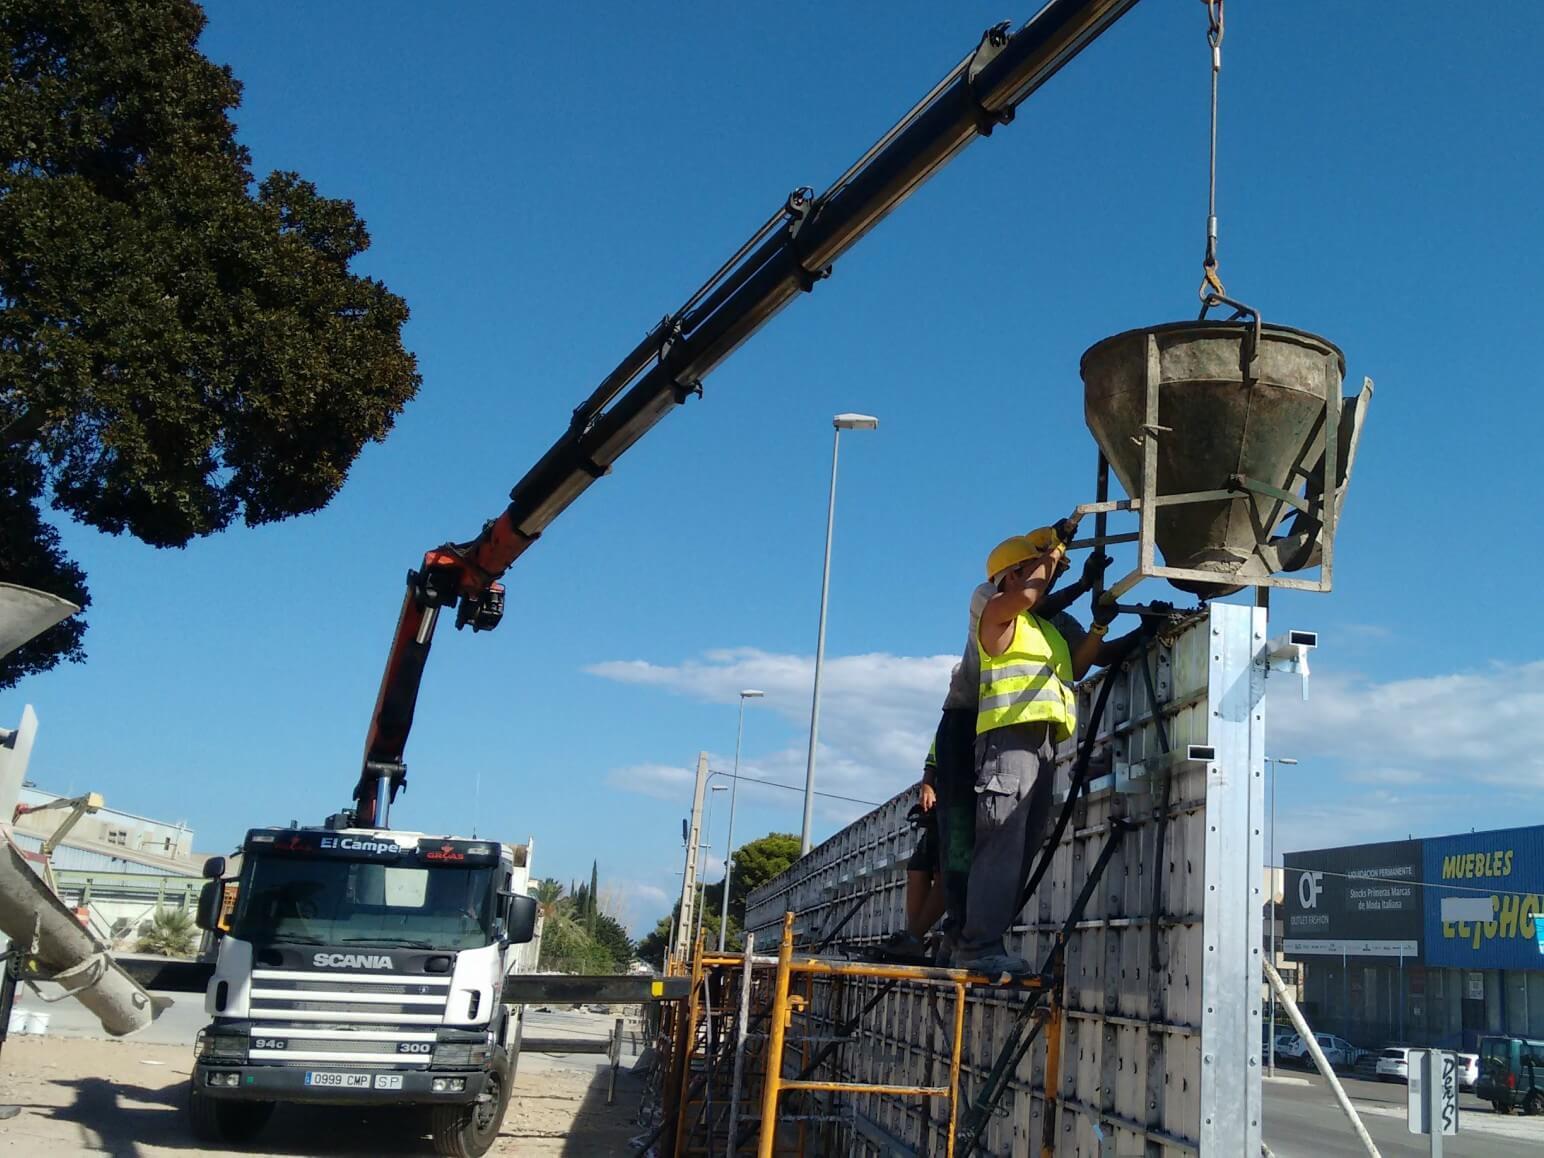 proyecto muro perimetral encofrados de aluminio construccion strong forms alicante 15